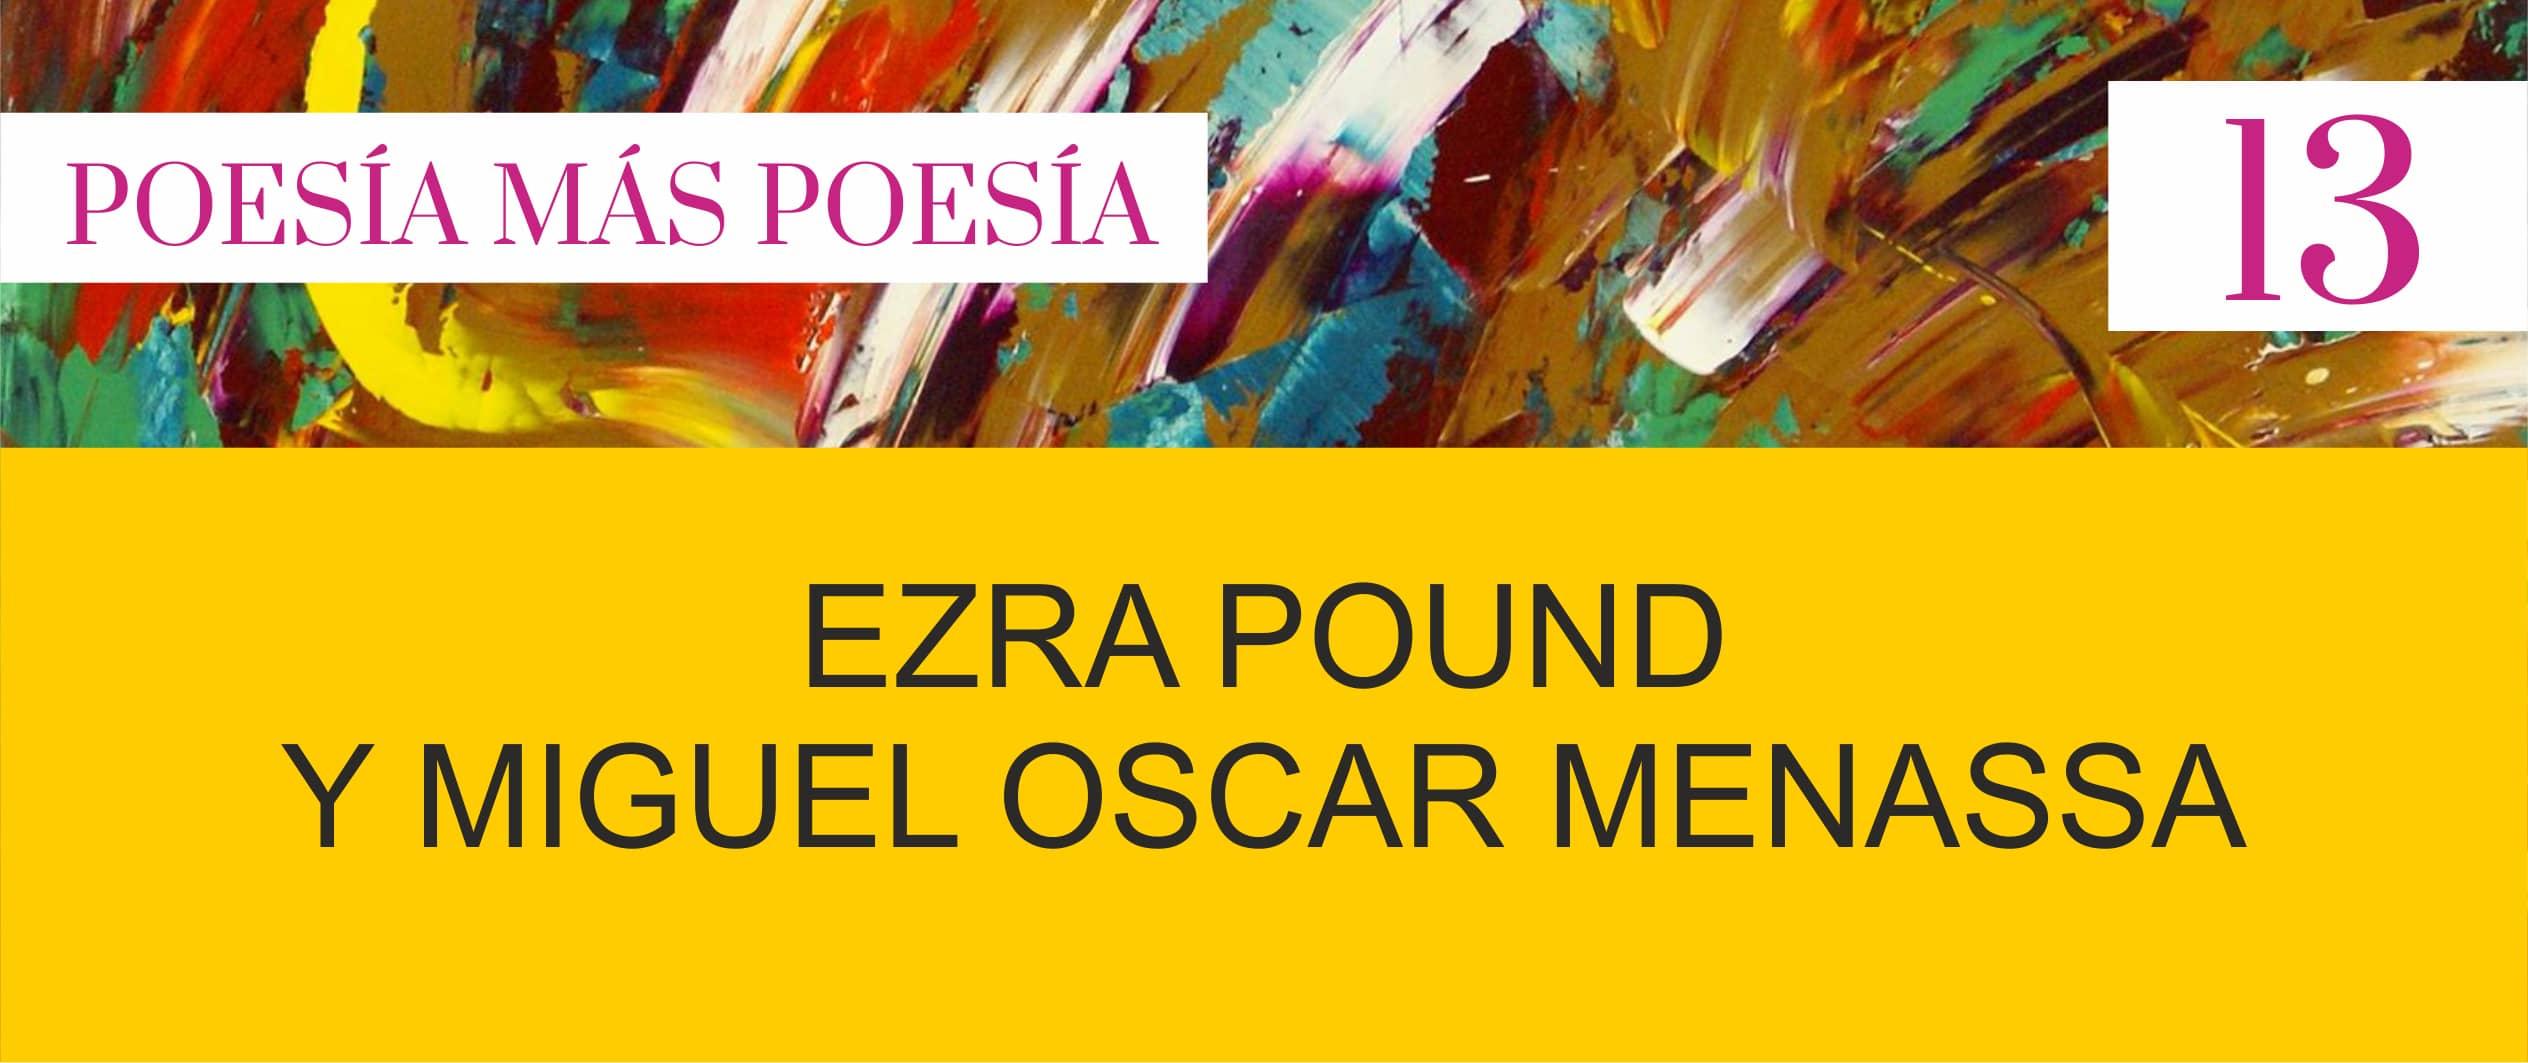 ezra Webp.net - Poesia Online